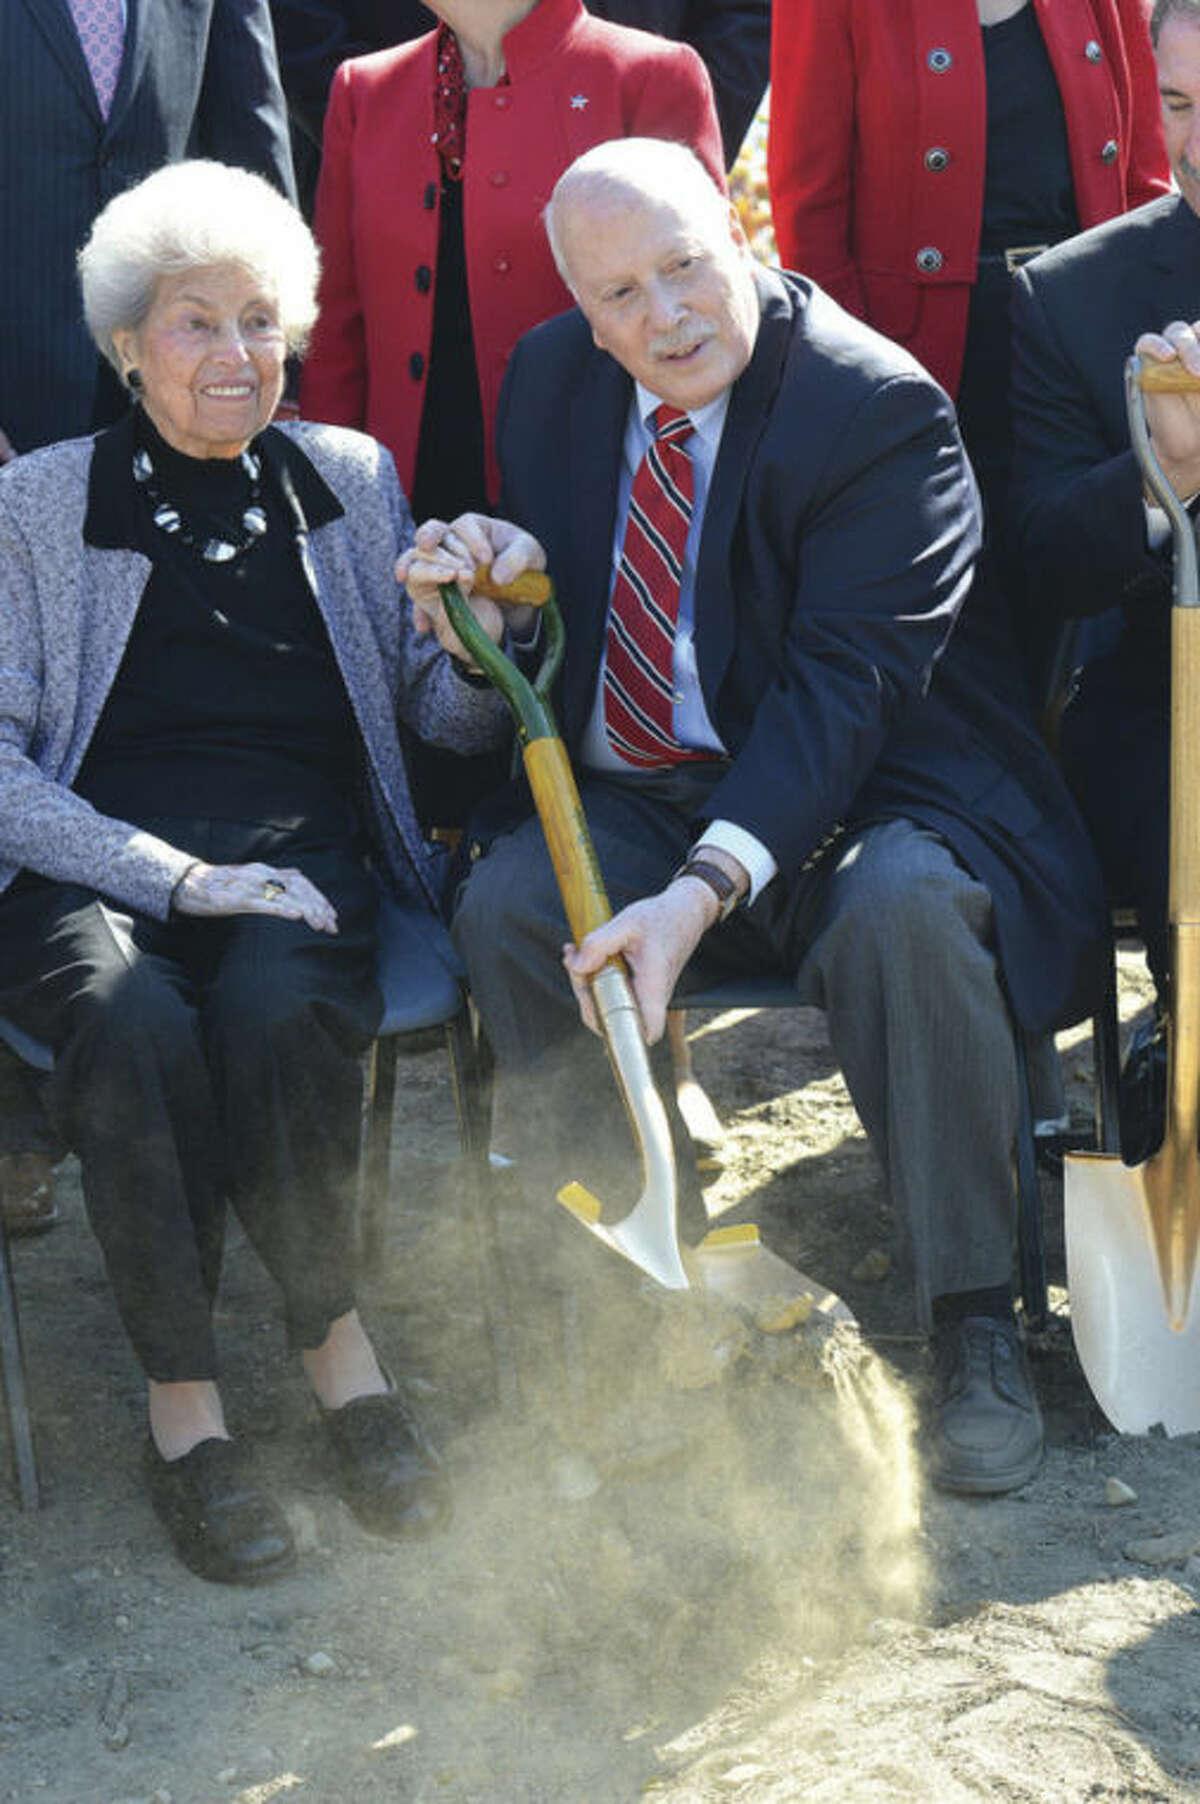 Hour Photo/Alex von Kleydorff . Mimi Levitt and First Selectman Gordon Joseloff grab a shovel of dirt during the groundbreaking ceremony for the Levitt Pavillion for the Performing Arts in Westport.